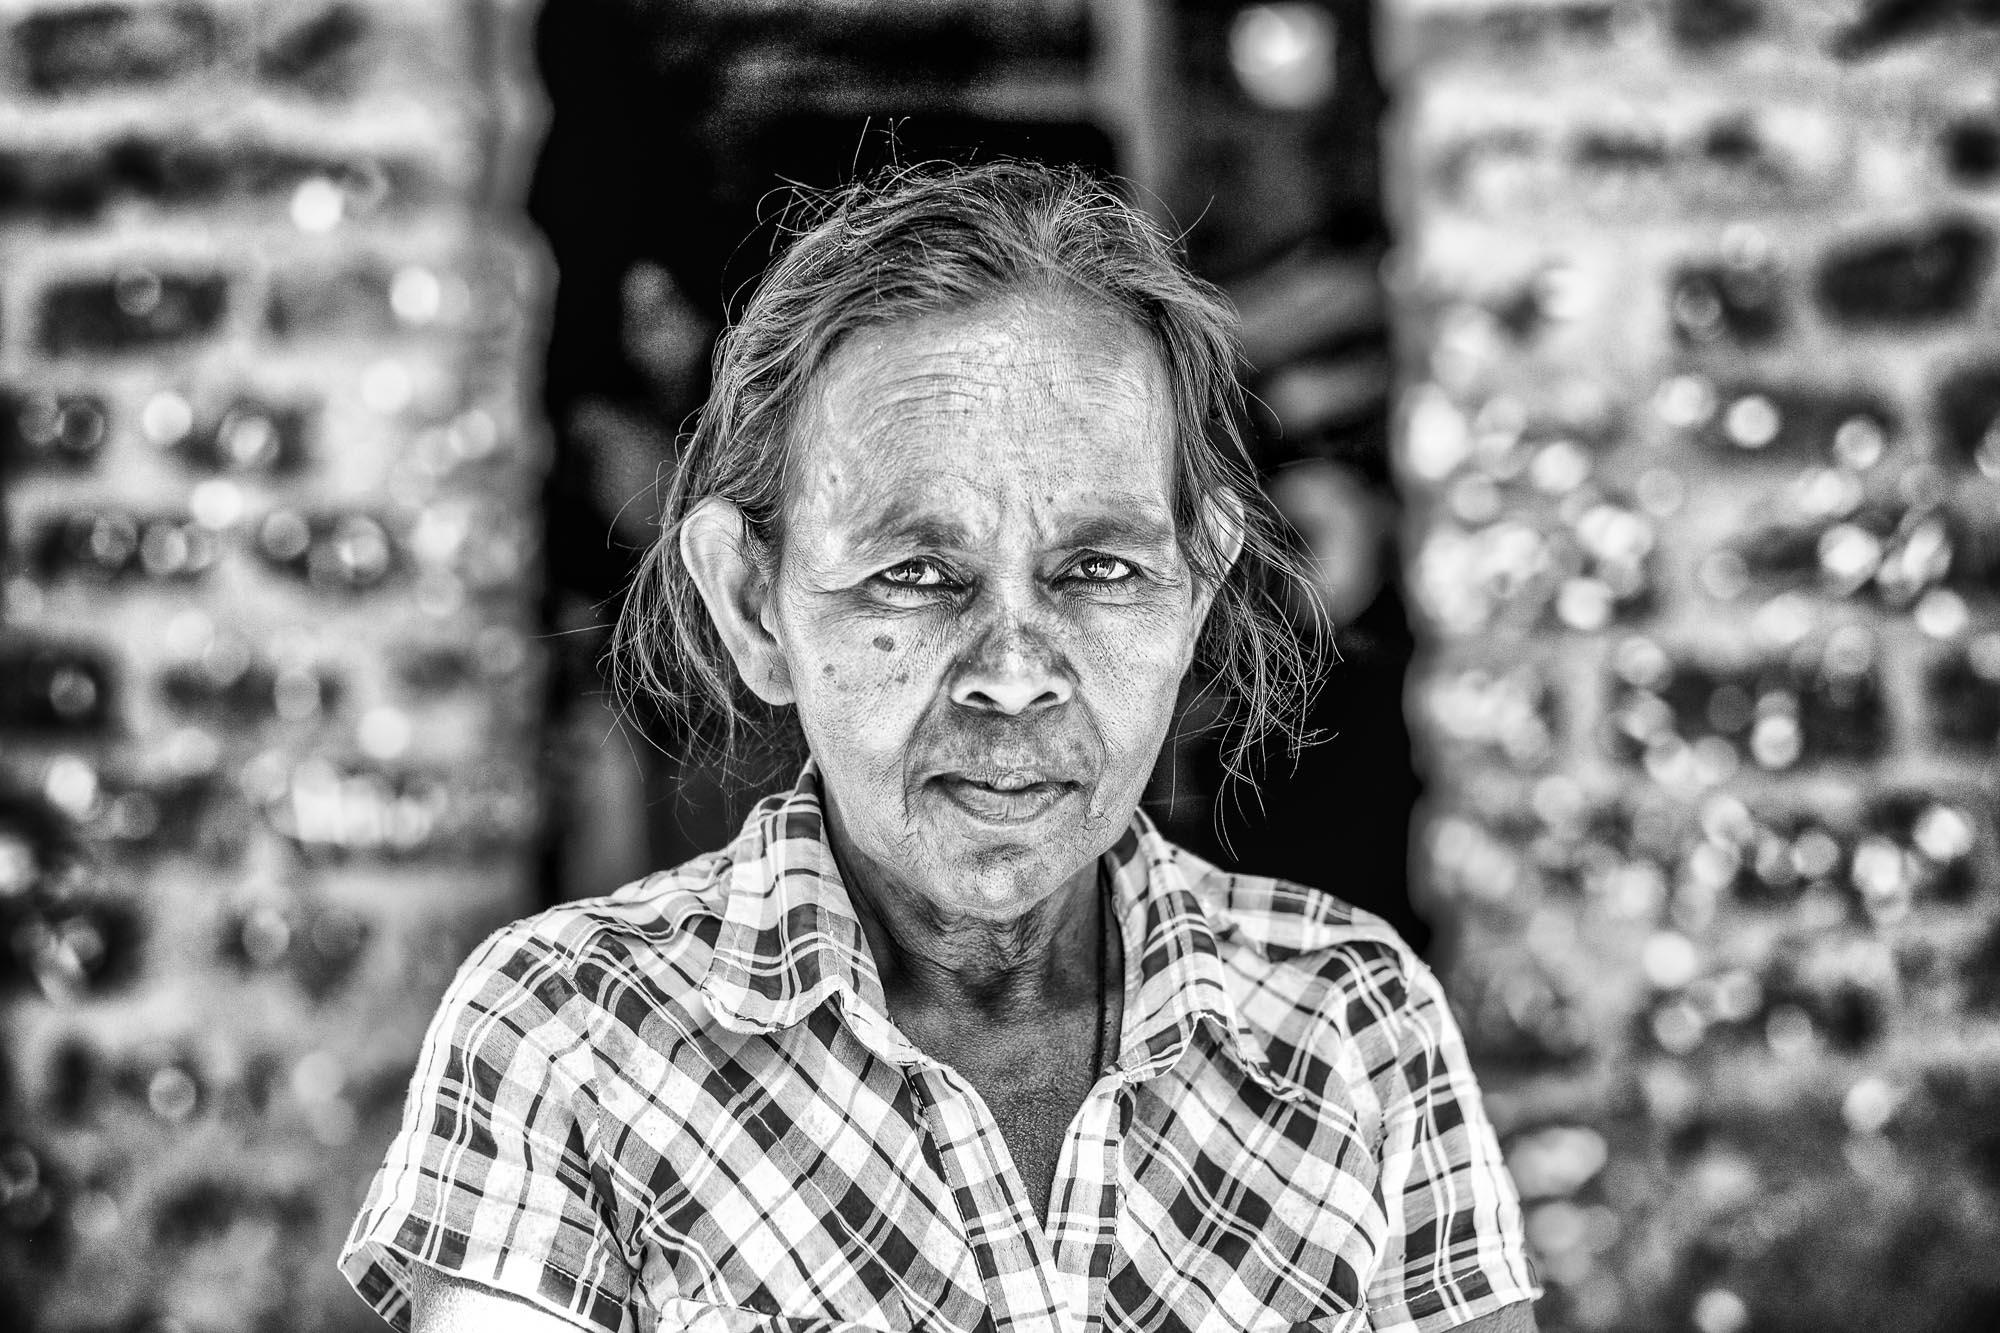 Vadda sri lanka indingenous group people photography - veddas women photograph portrait